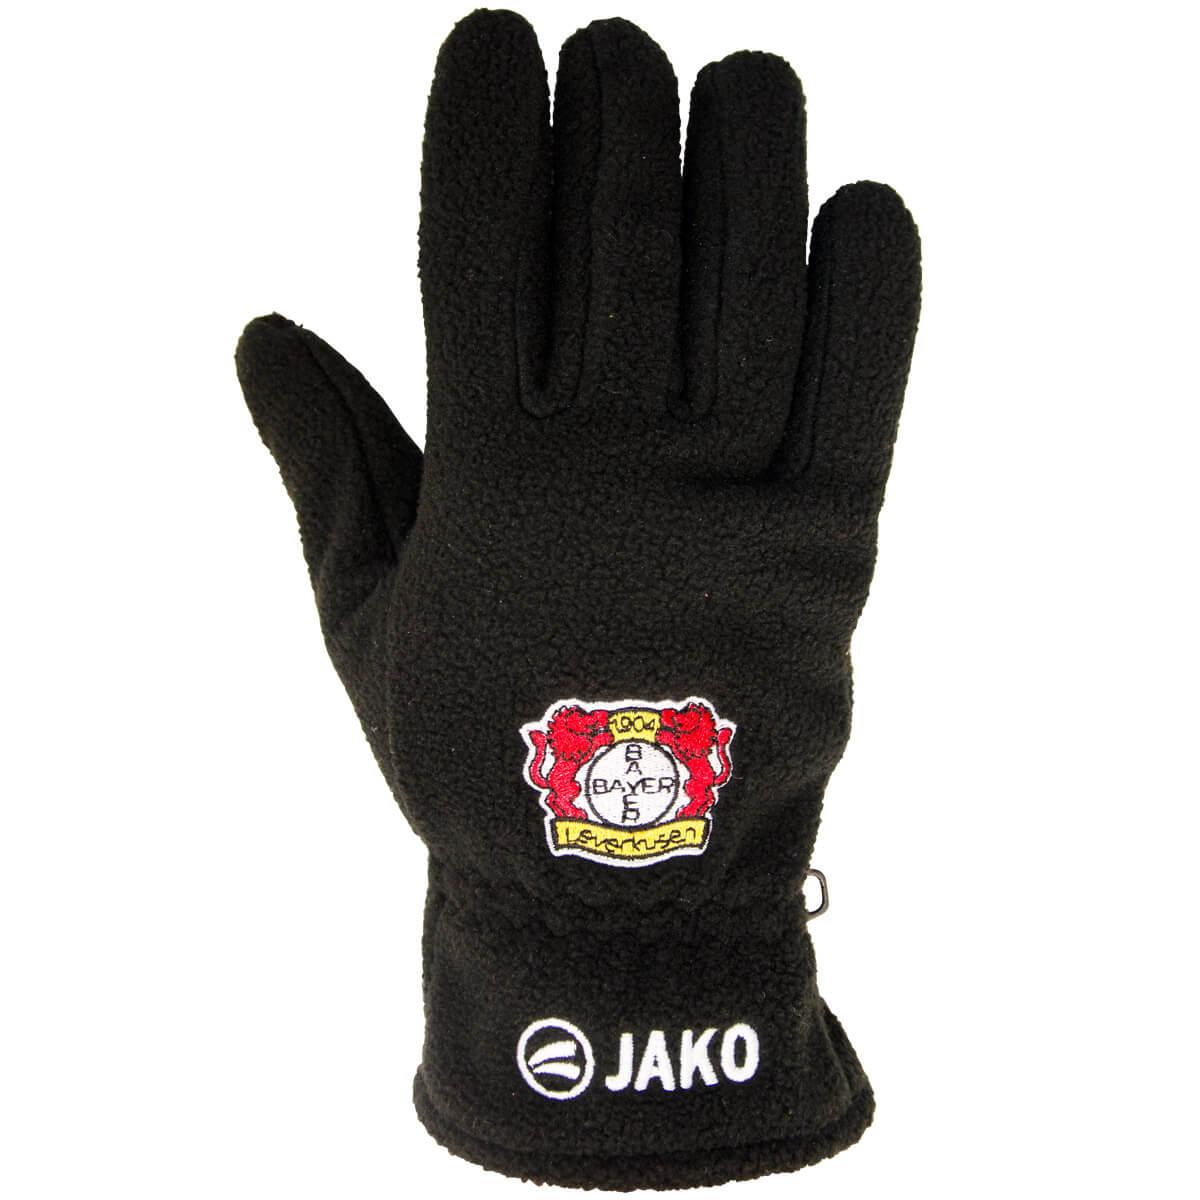 Bayer 04 Leverkusen Fleecehandschuhe -  | Jako BA2587